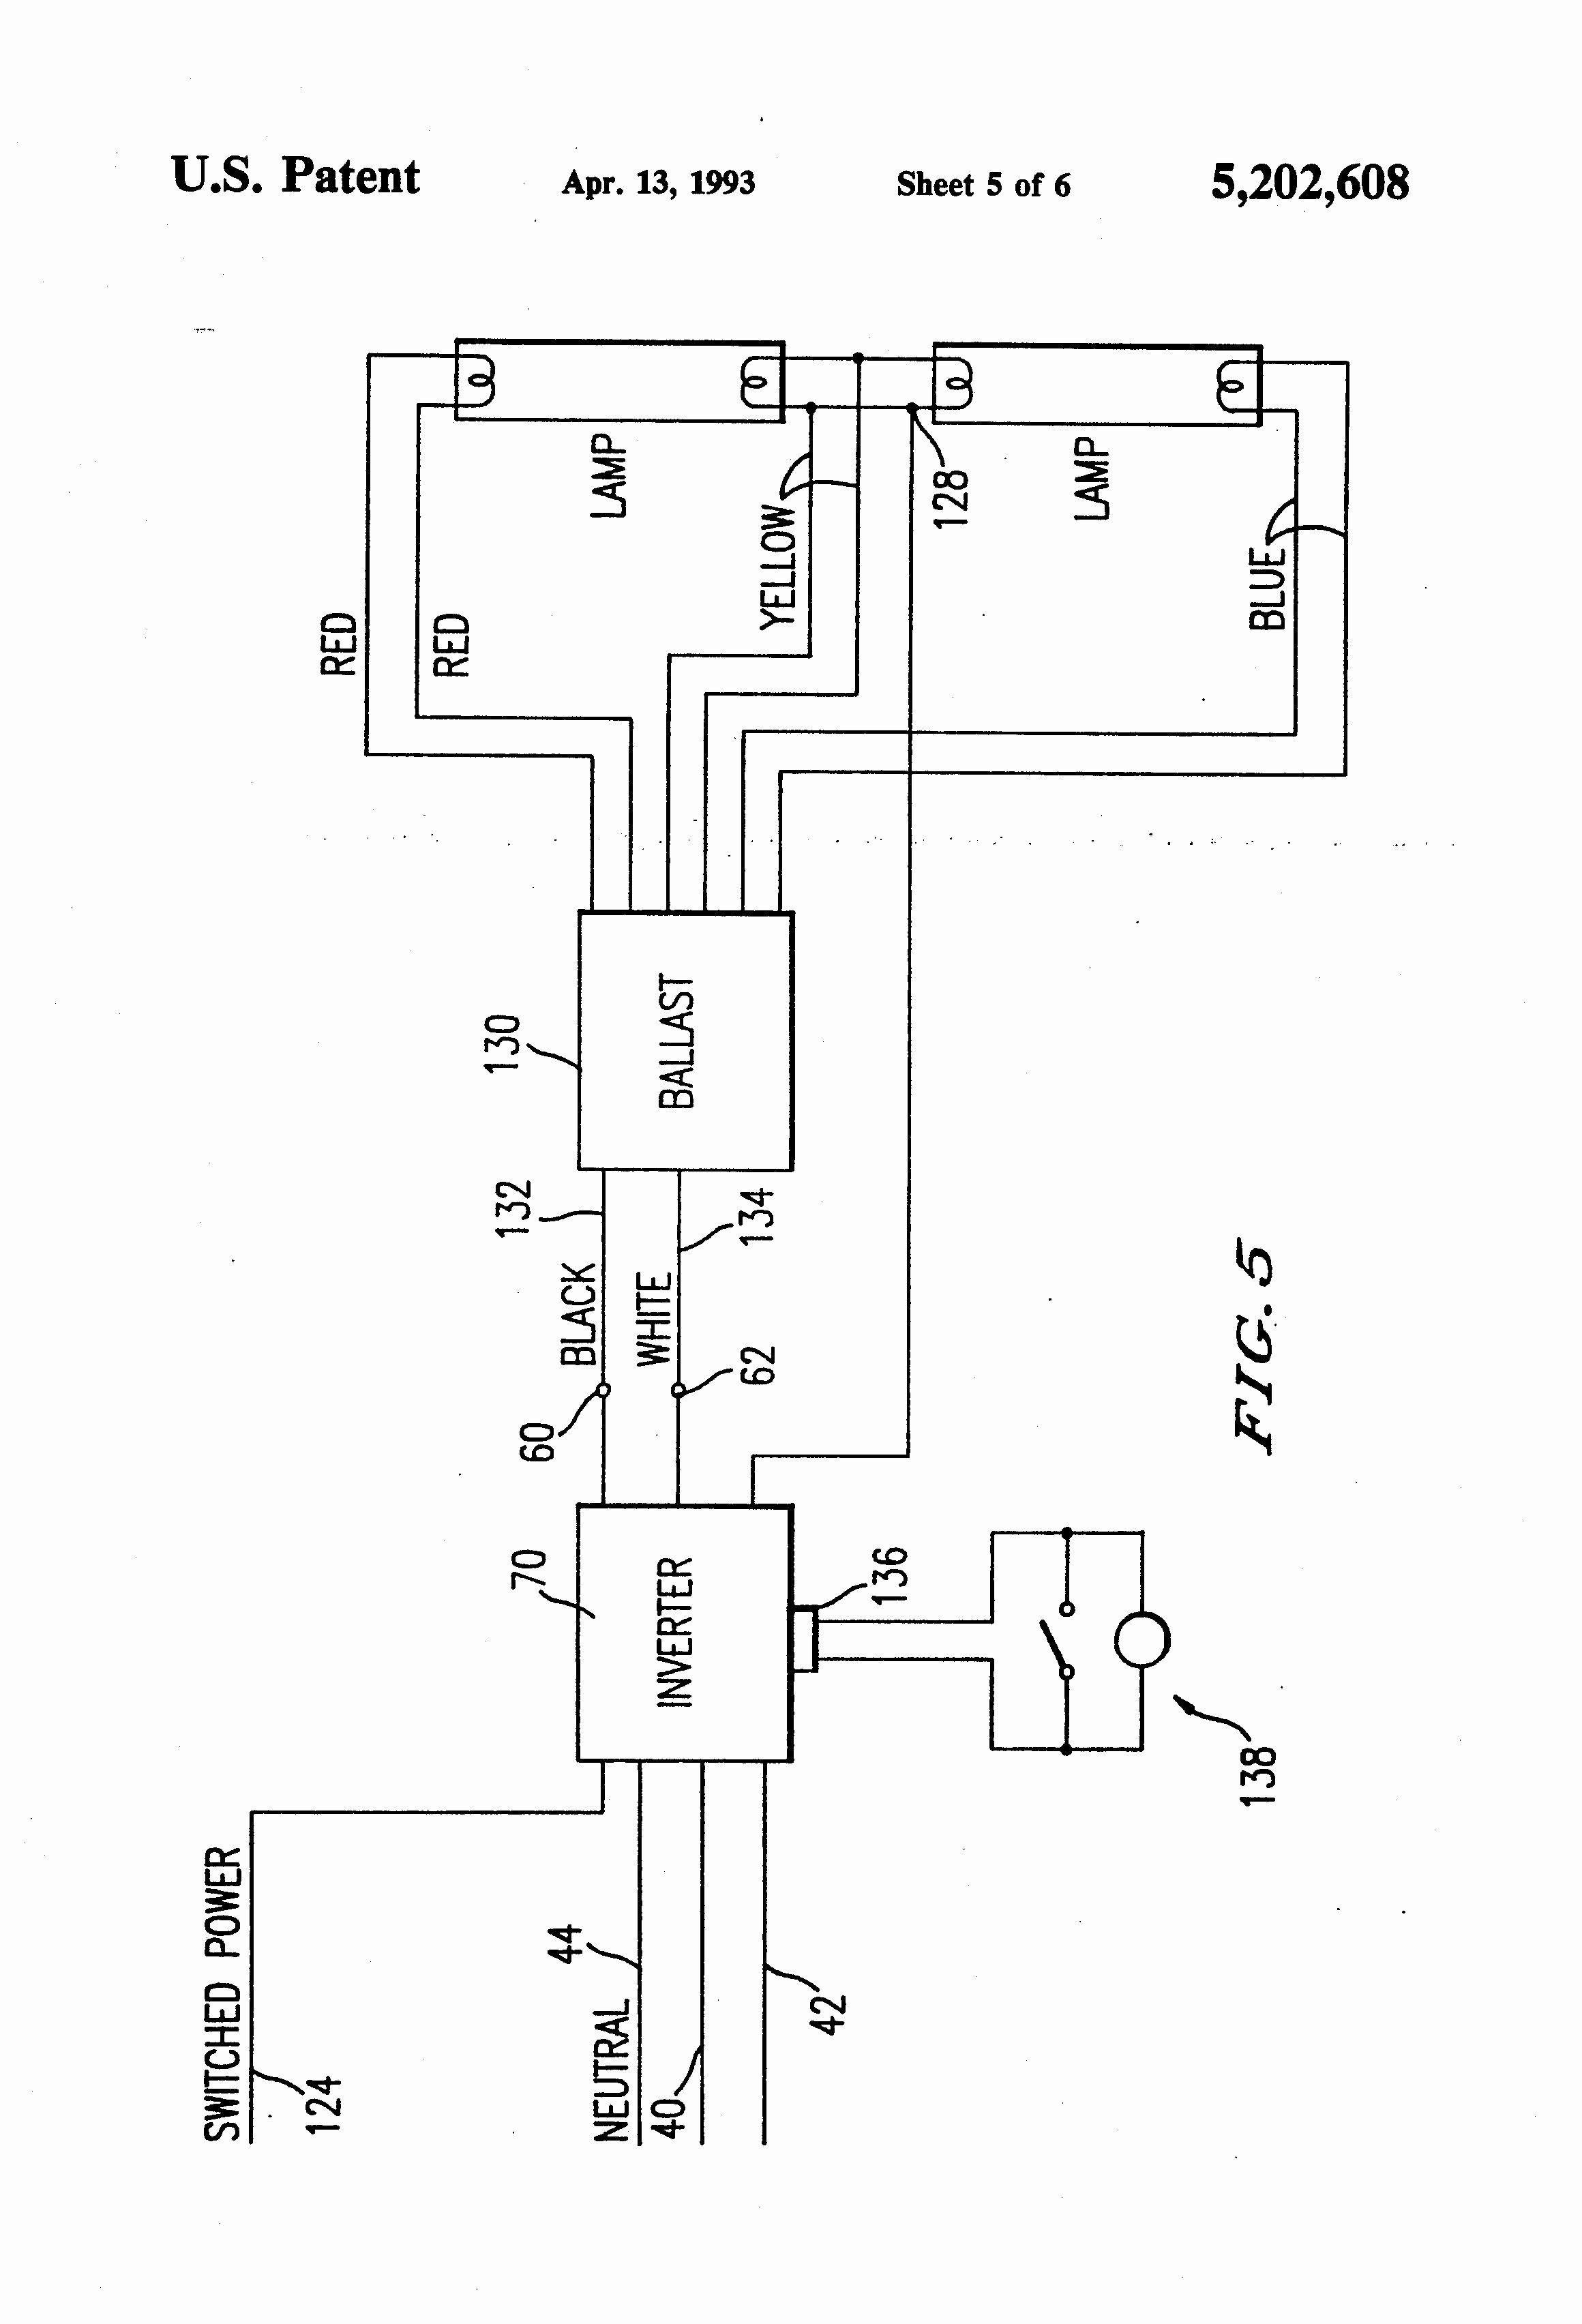 Diagram Ford Choke Wiring Diagram Full Version Hd Quality Wiring Diagram Diagramingco Deuxenchiffres Fr